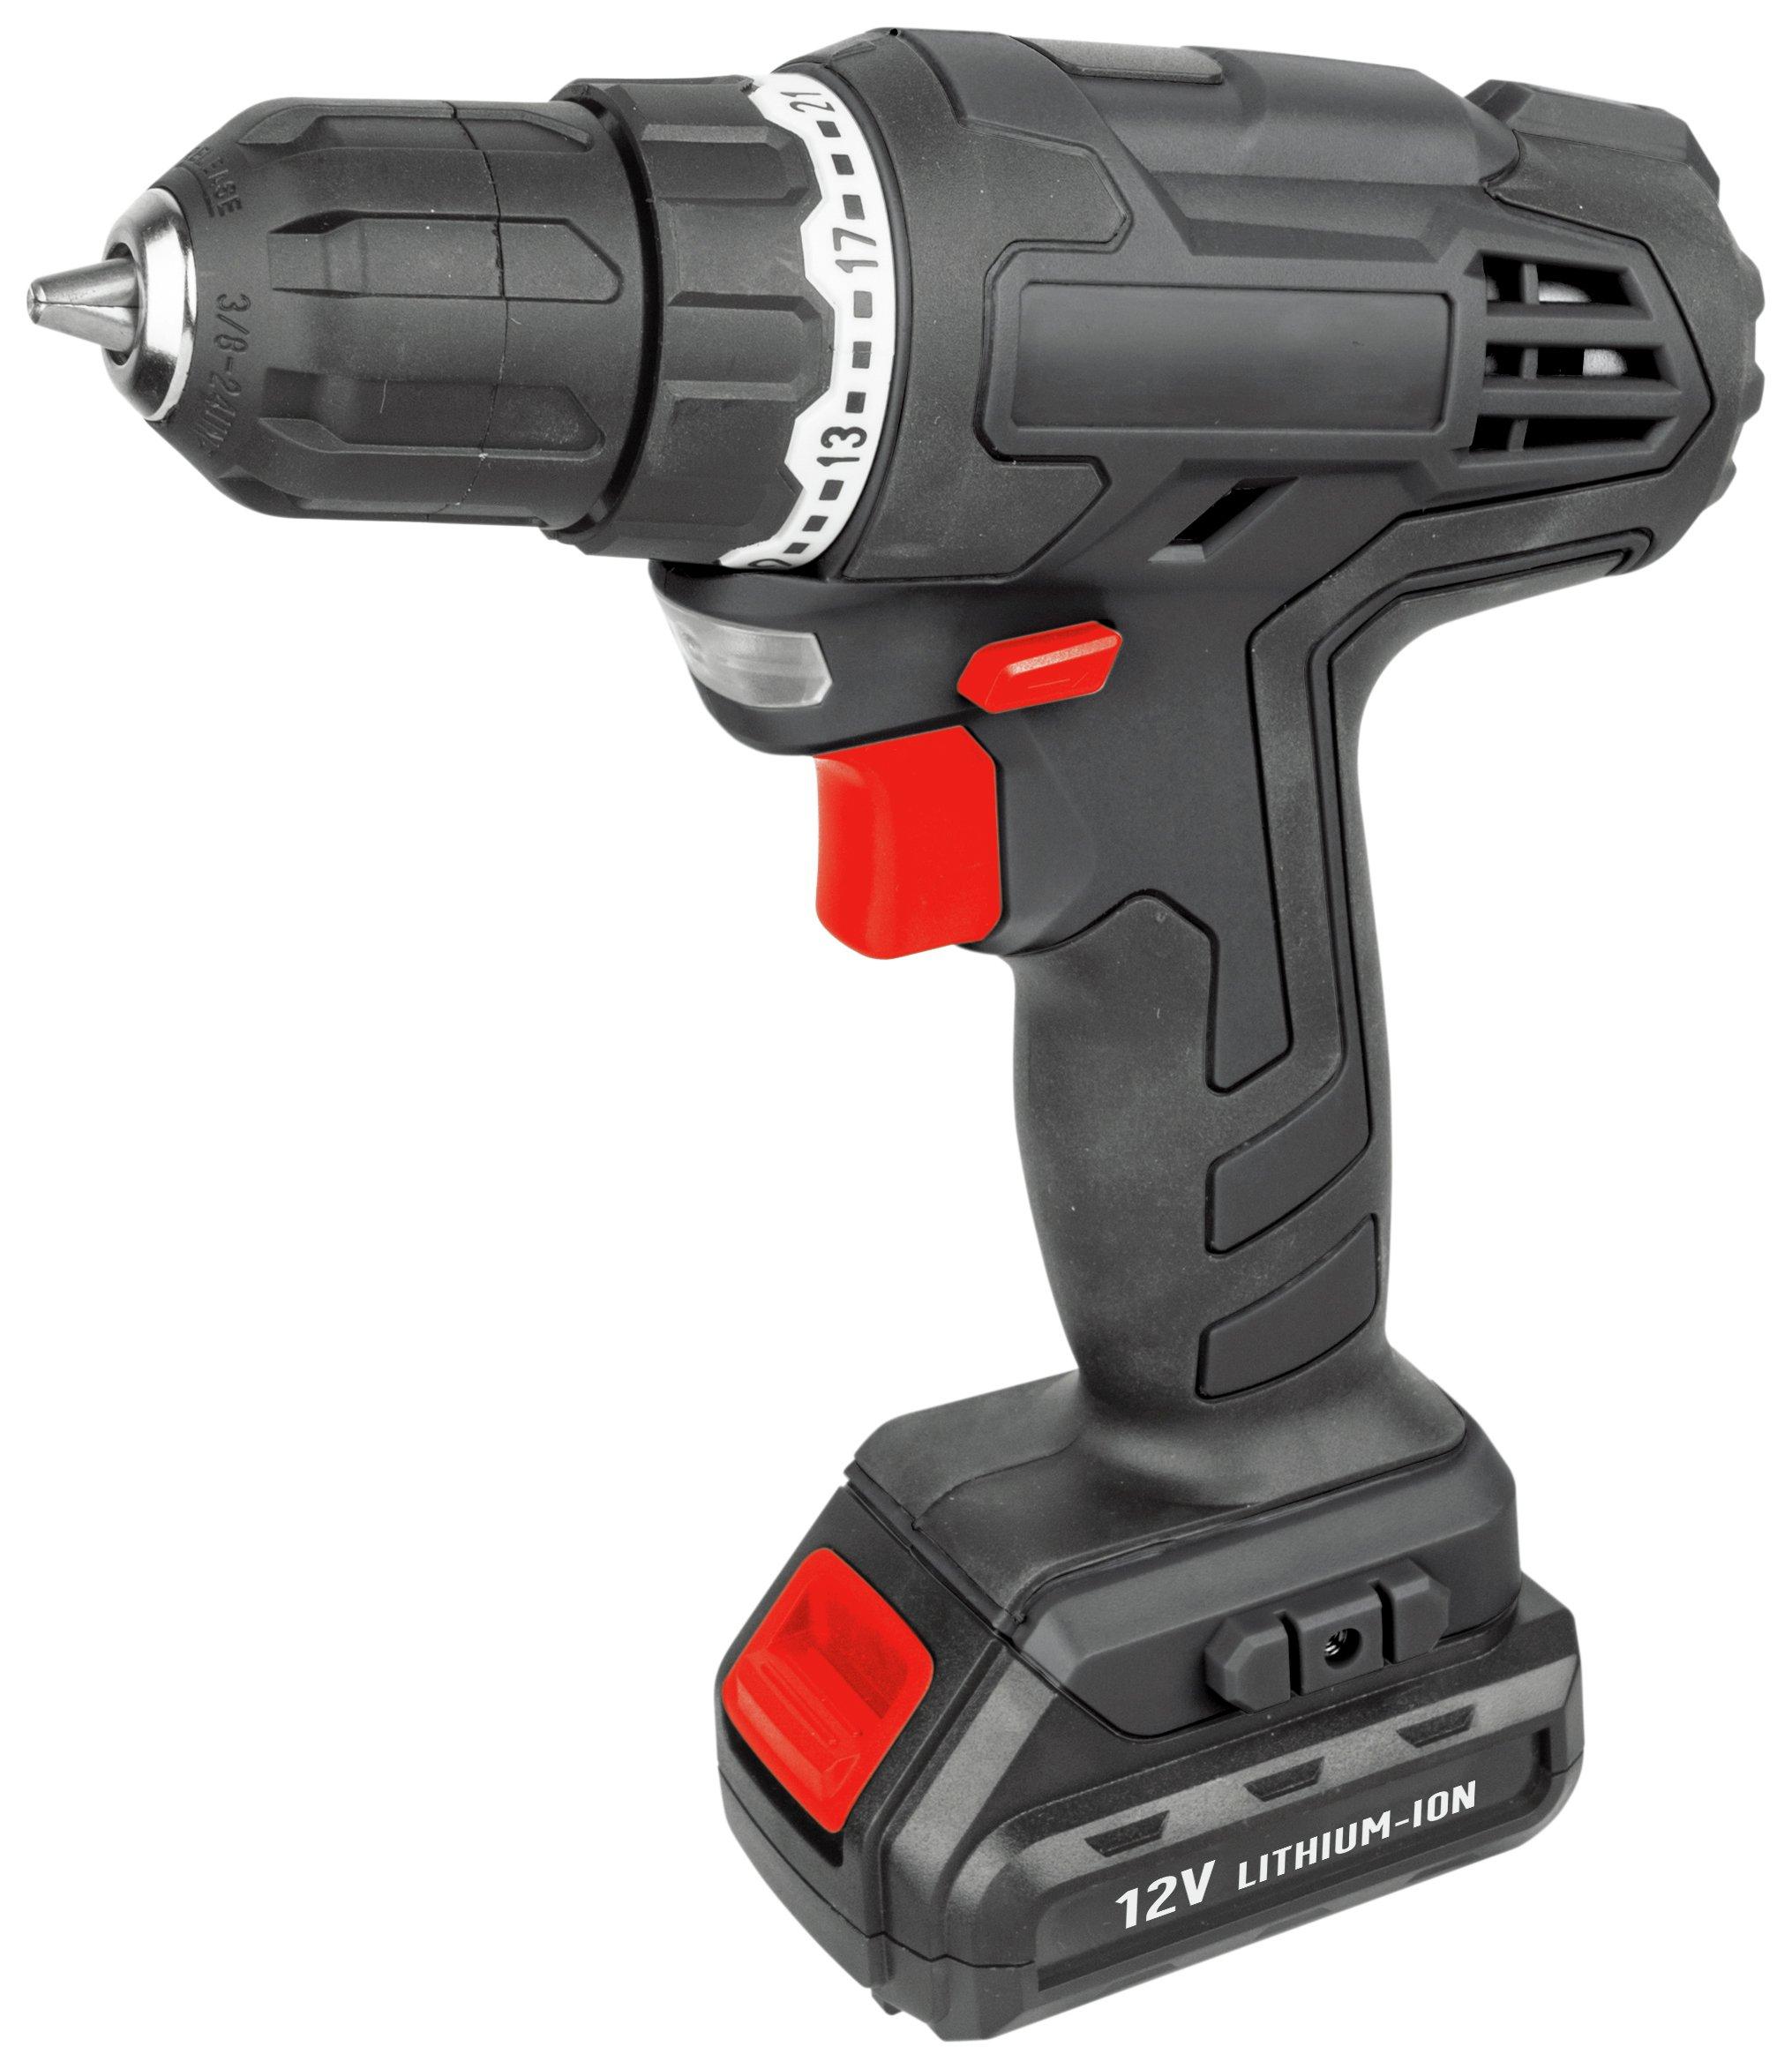 Challenge Li-Ion Cordless Drill Driver - 12V